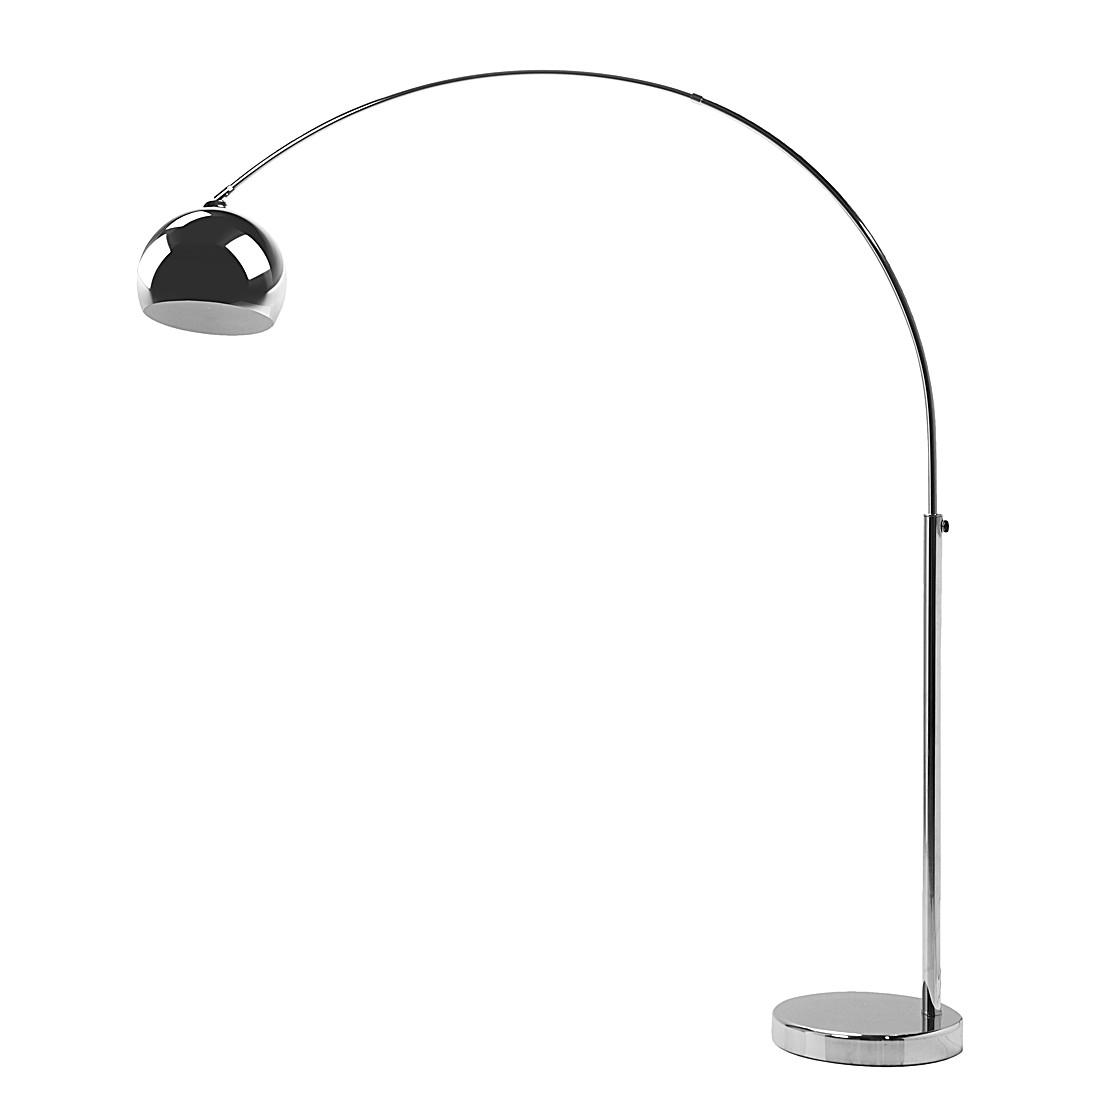 EEK A++, Stehleuchte SL Lounge Chrome Small Deal Eco – Metall/Kunststoff – 1-flammig, Kare Design online bestellen